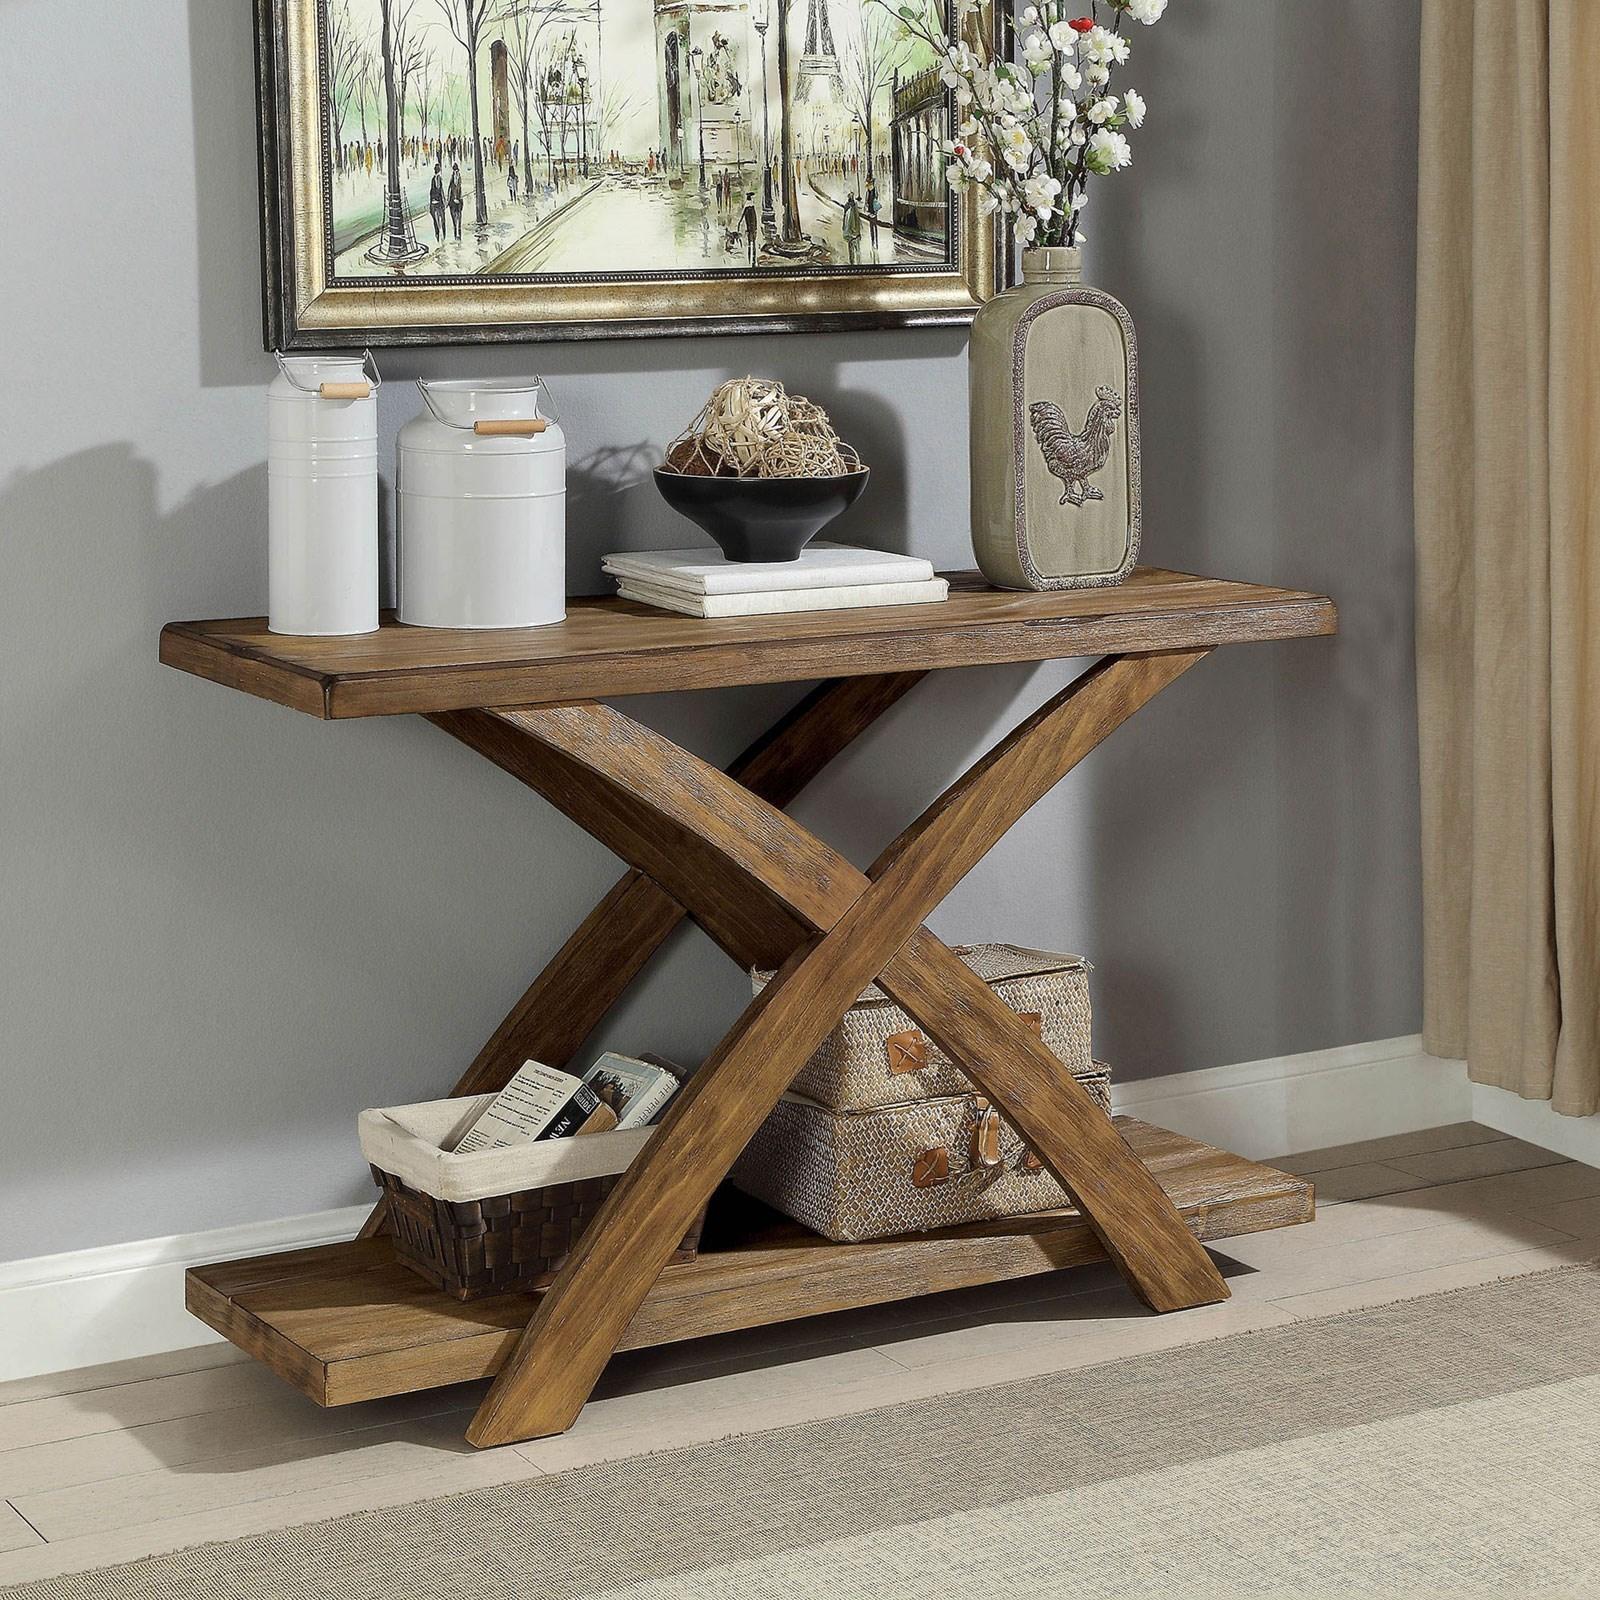 Furniture Of America Bryanna Rustic Sofa Table